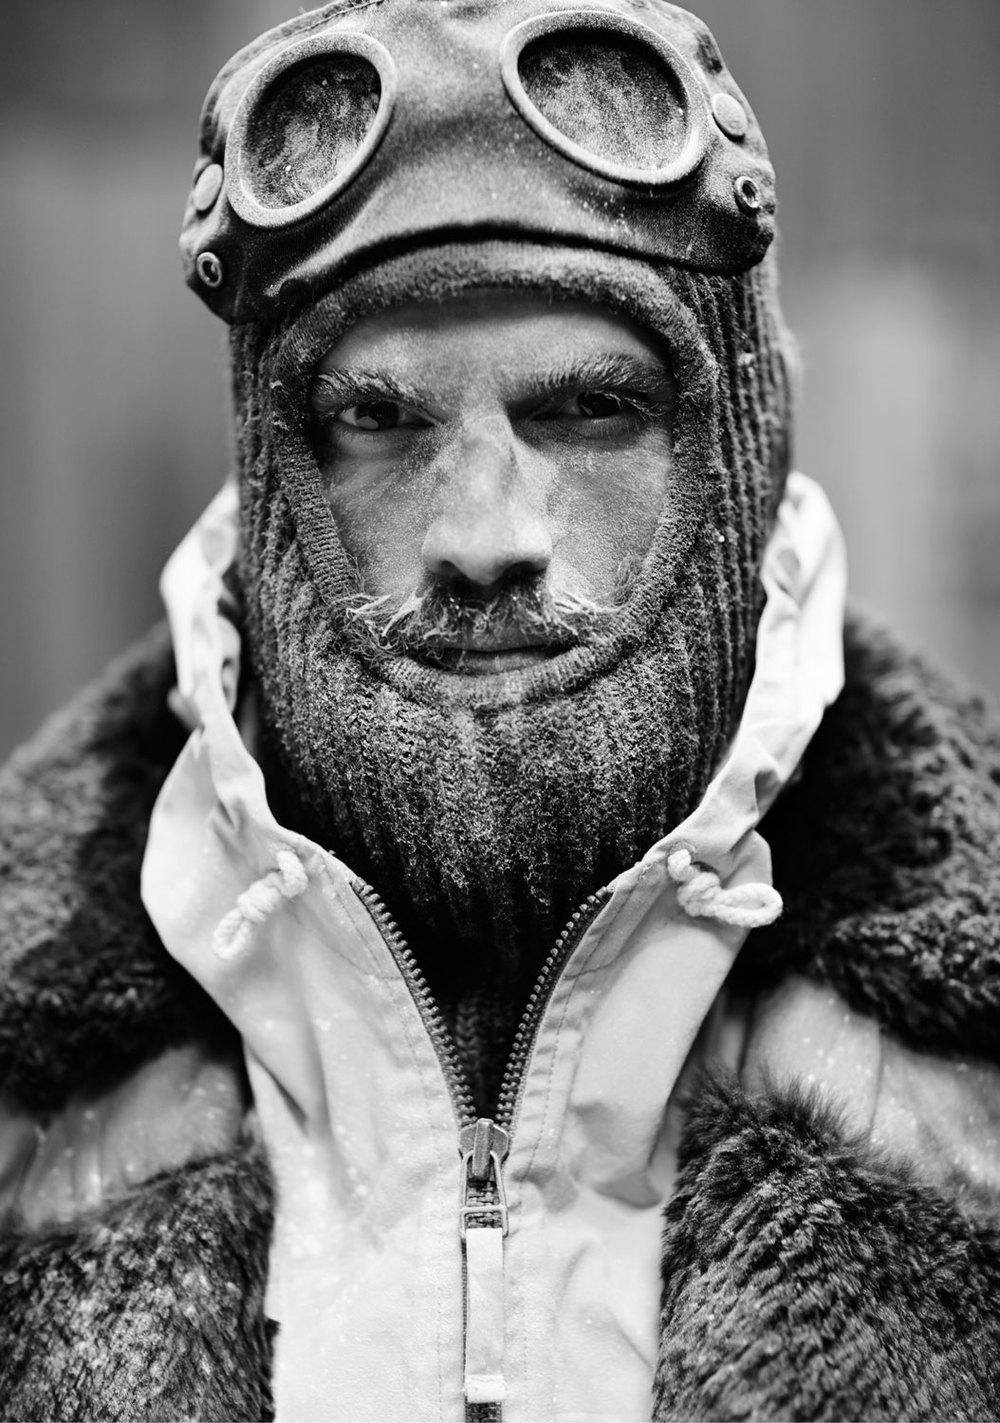 belstaff-jago-ice-explorers-twenty6-magazine.jpg